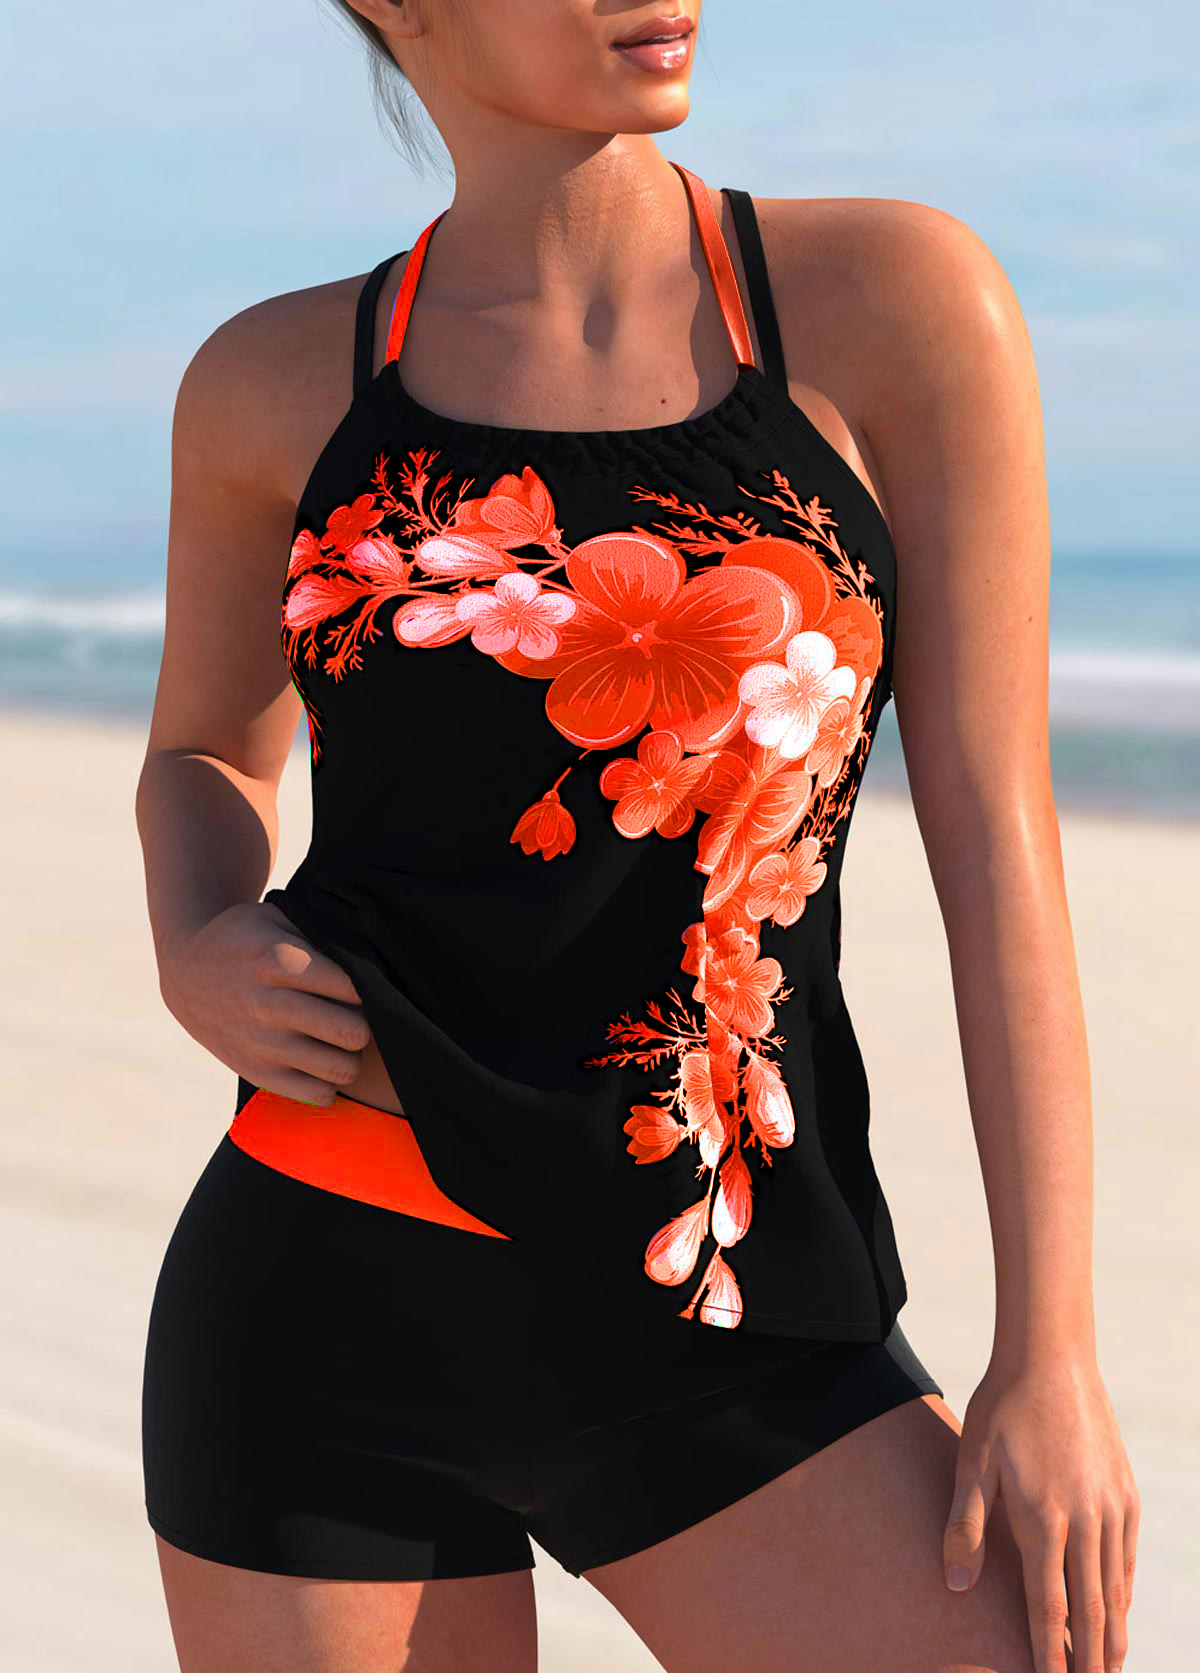 Floral Print Criss Cross Back Tie Back Tankini Set